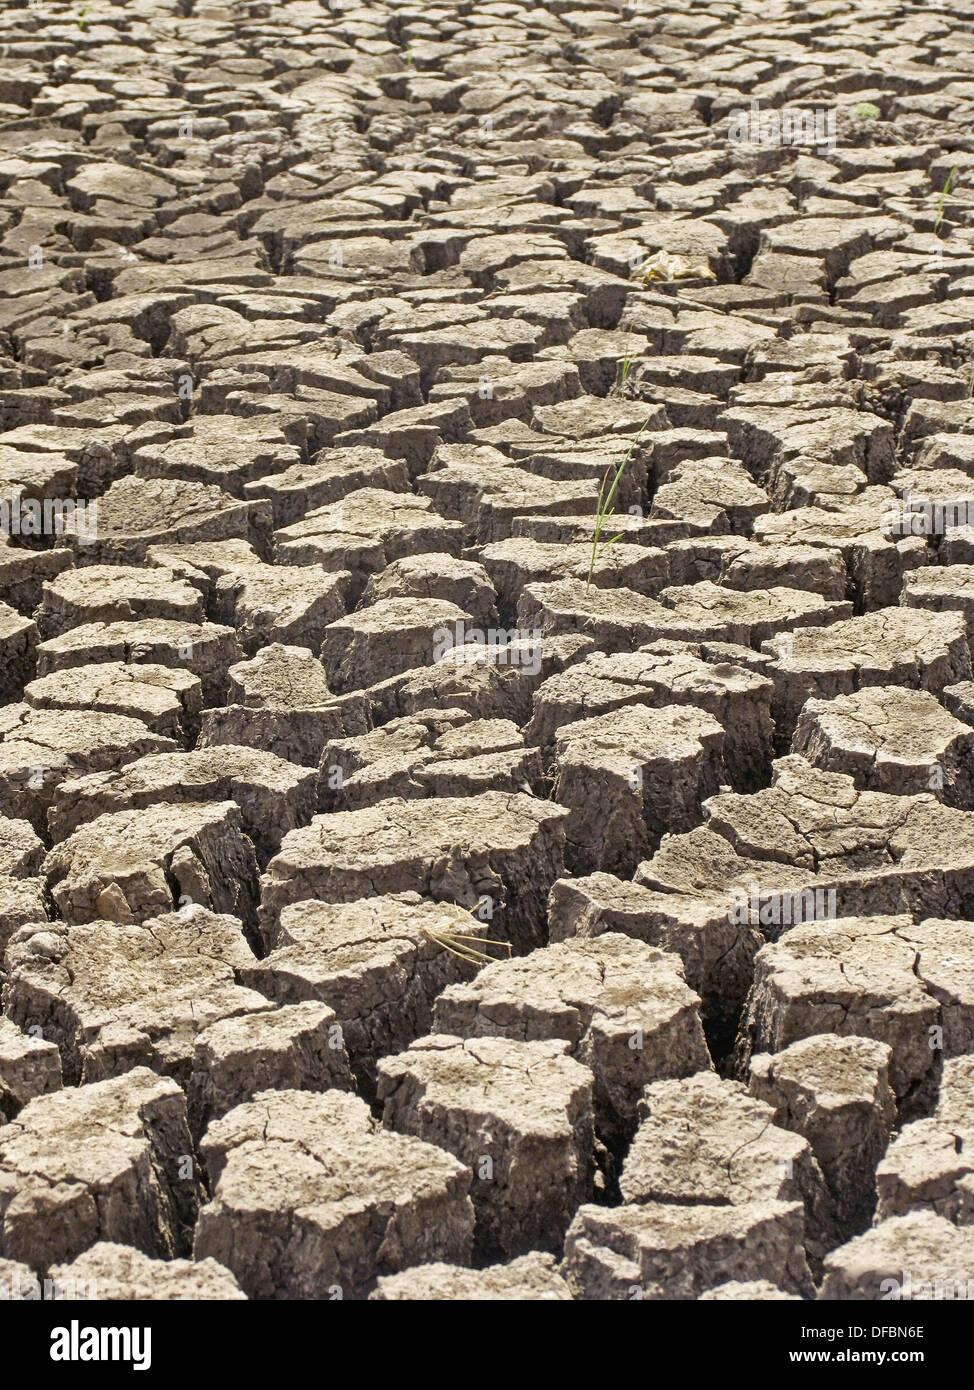 Arid, Parched, cracked land in a village  Maharashtra, India - Stock Image